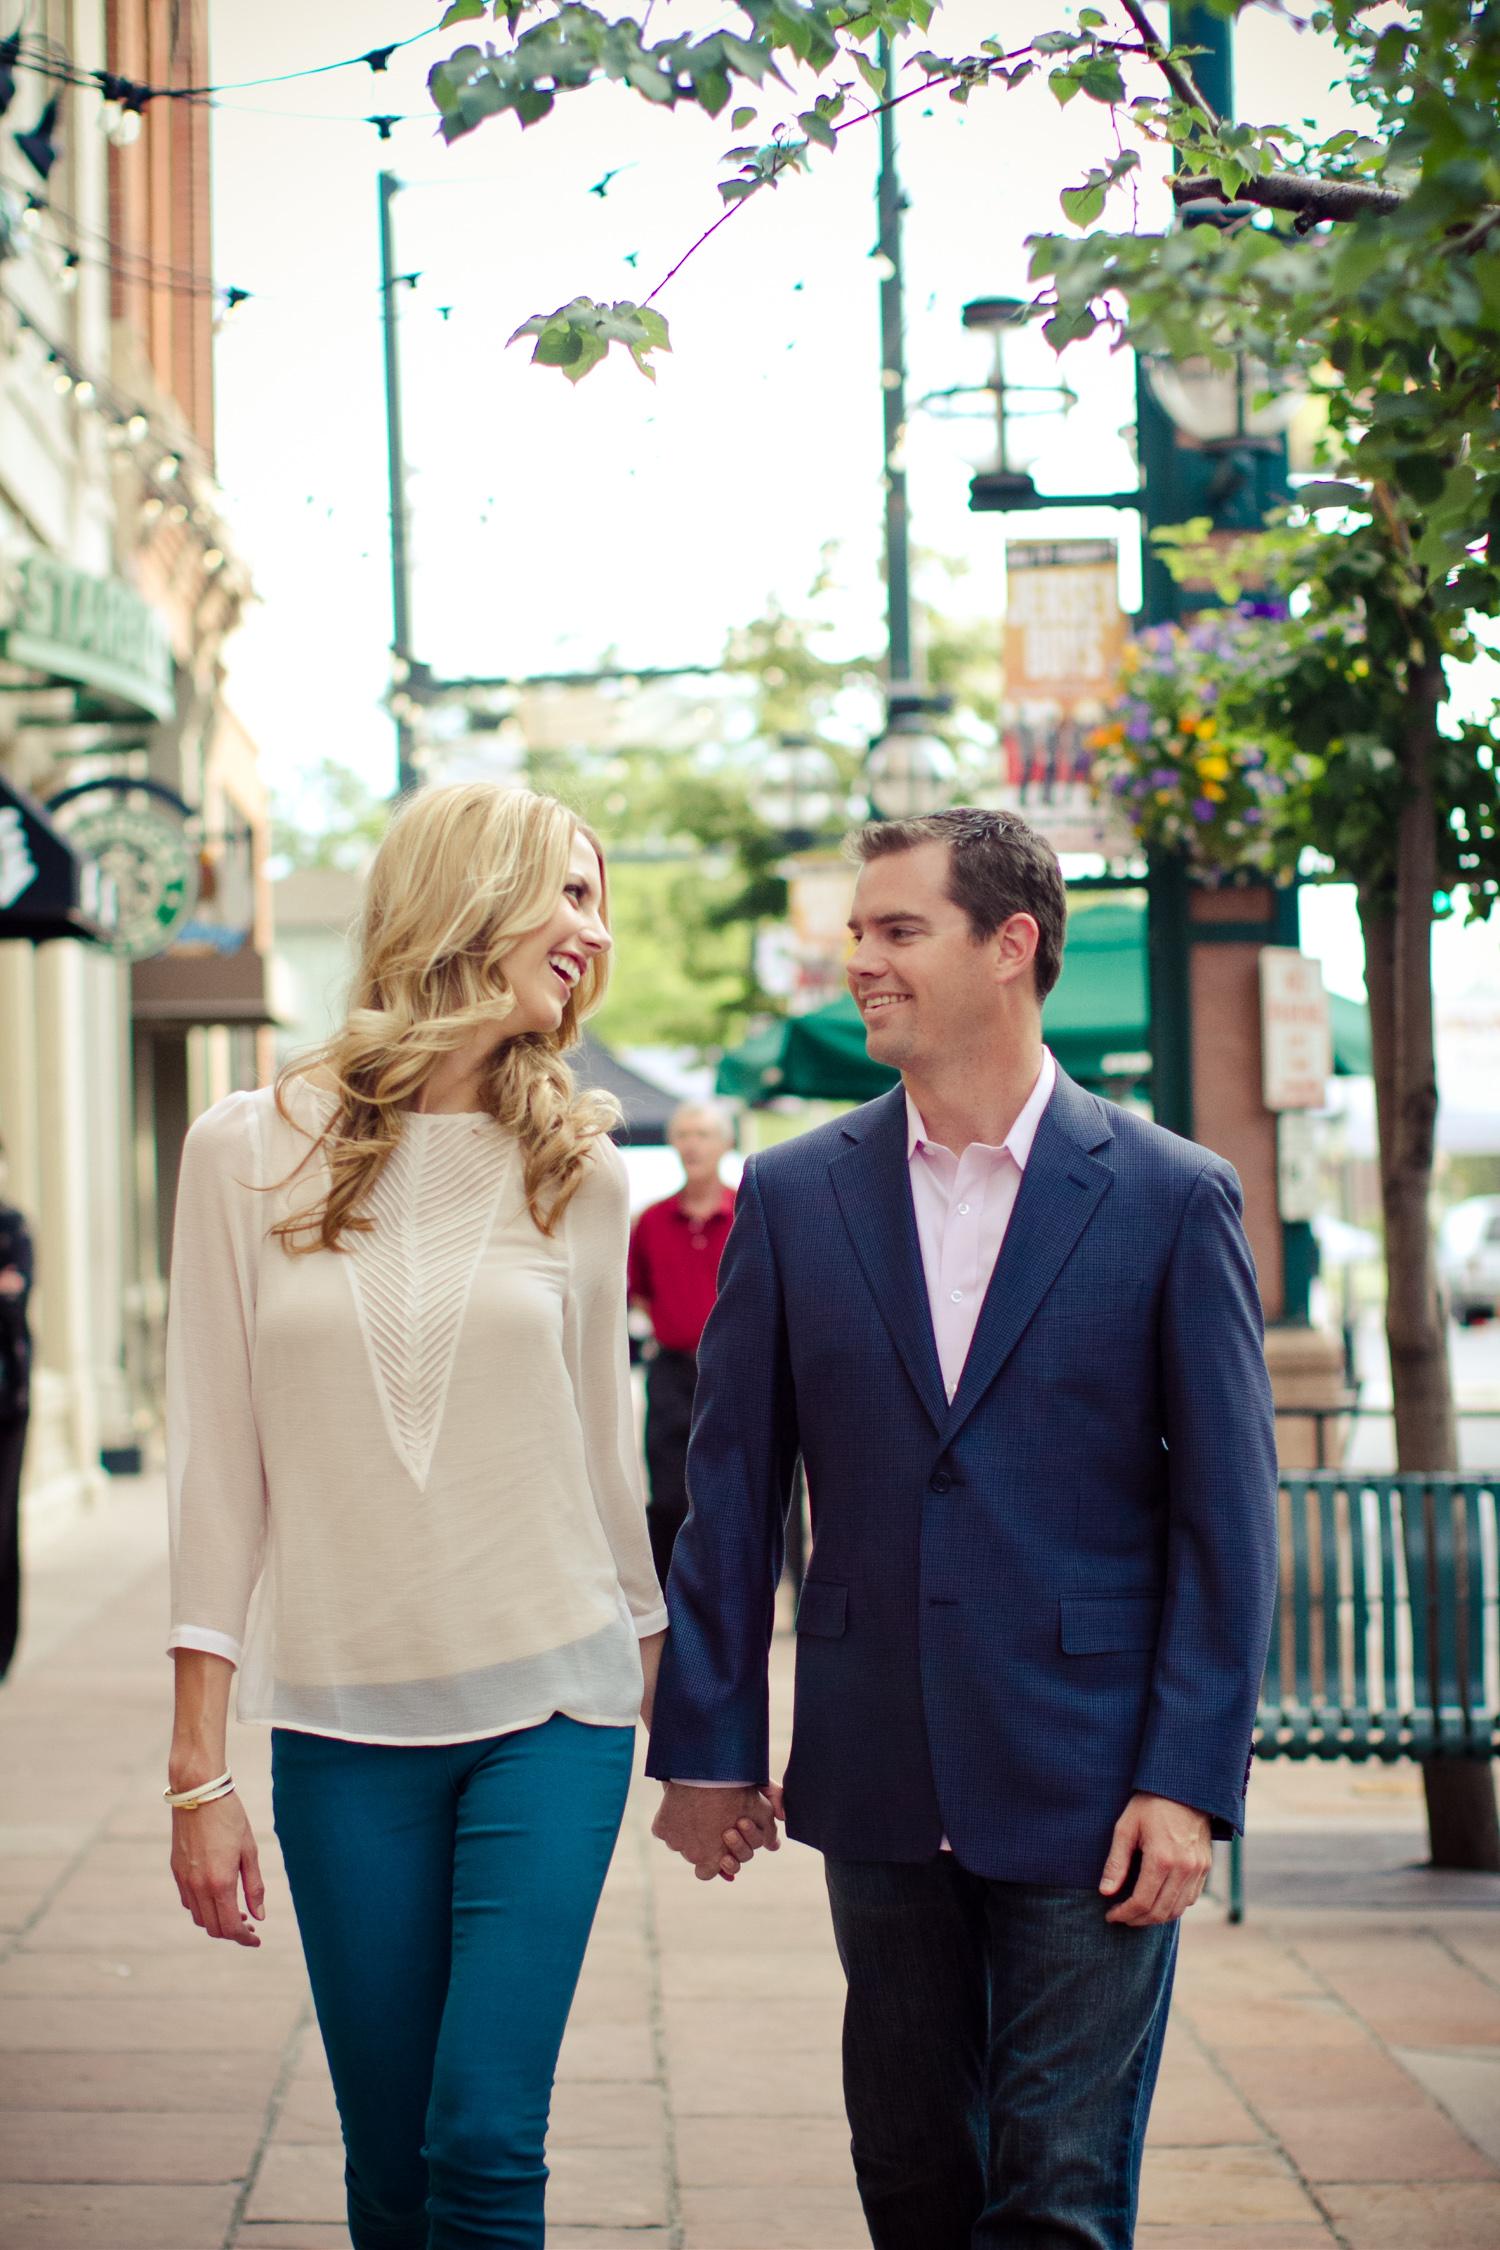 Downtown_Denver_Engagement_Photos_021.JPG